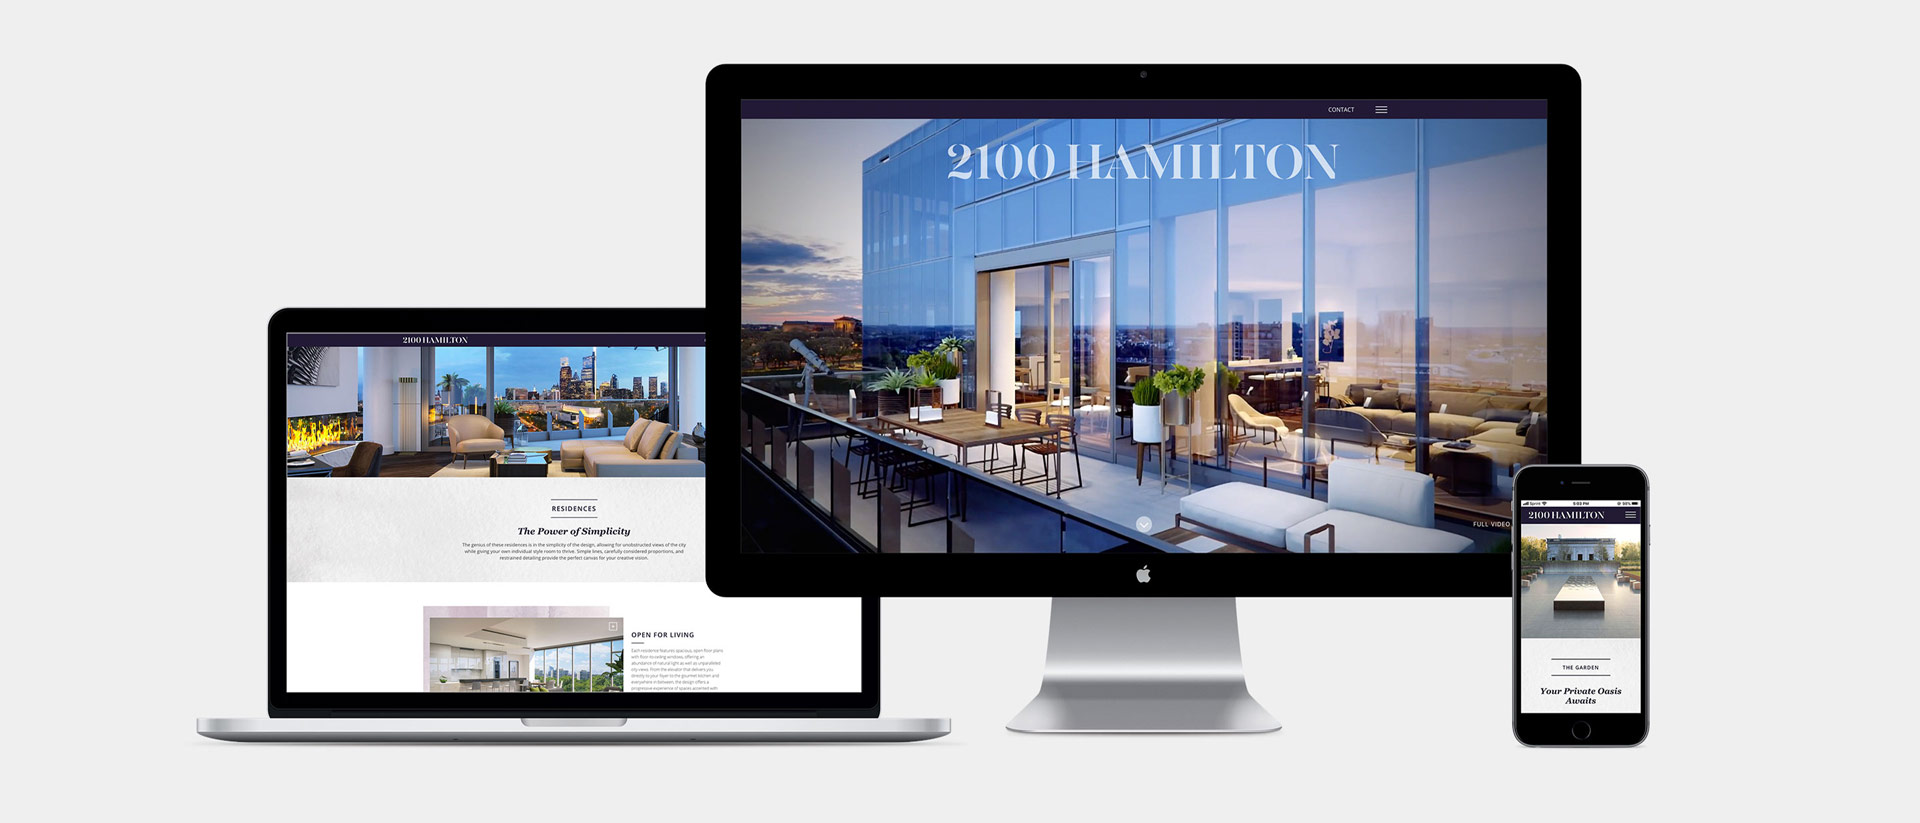 Web Design for 2100 Hamilton in Philadelphia